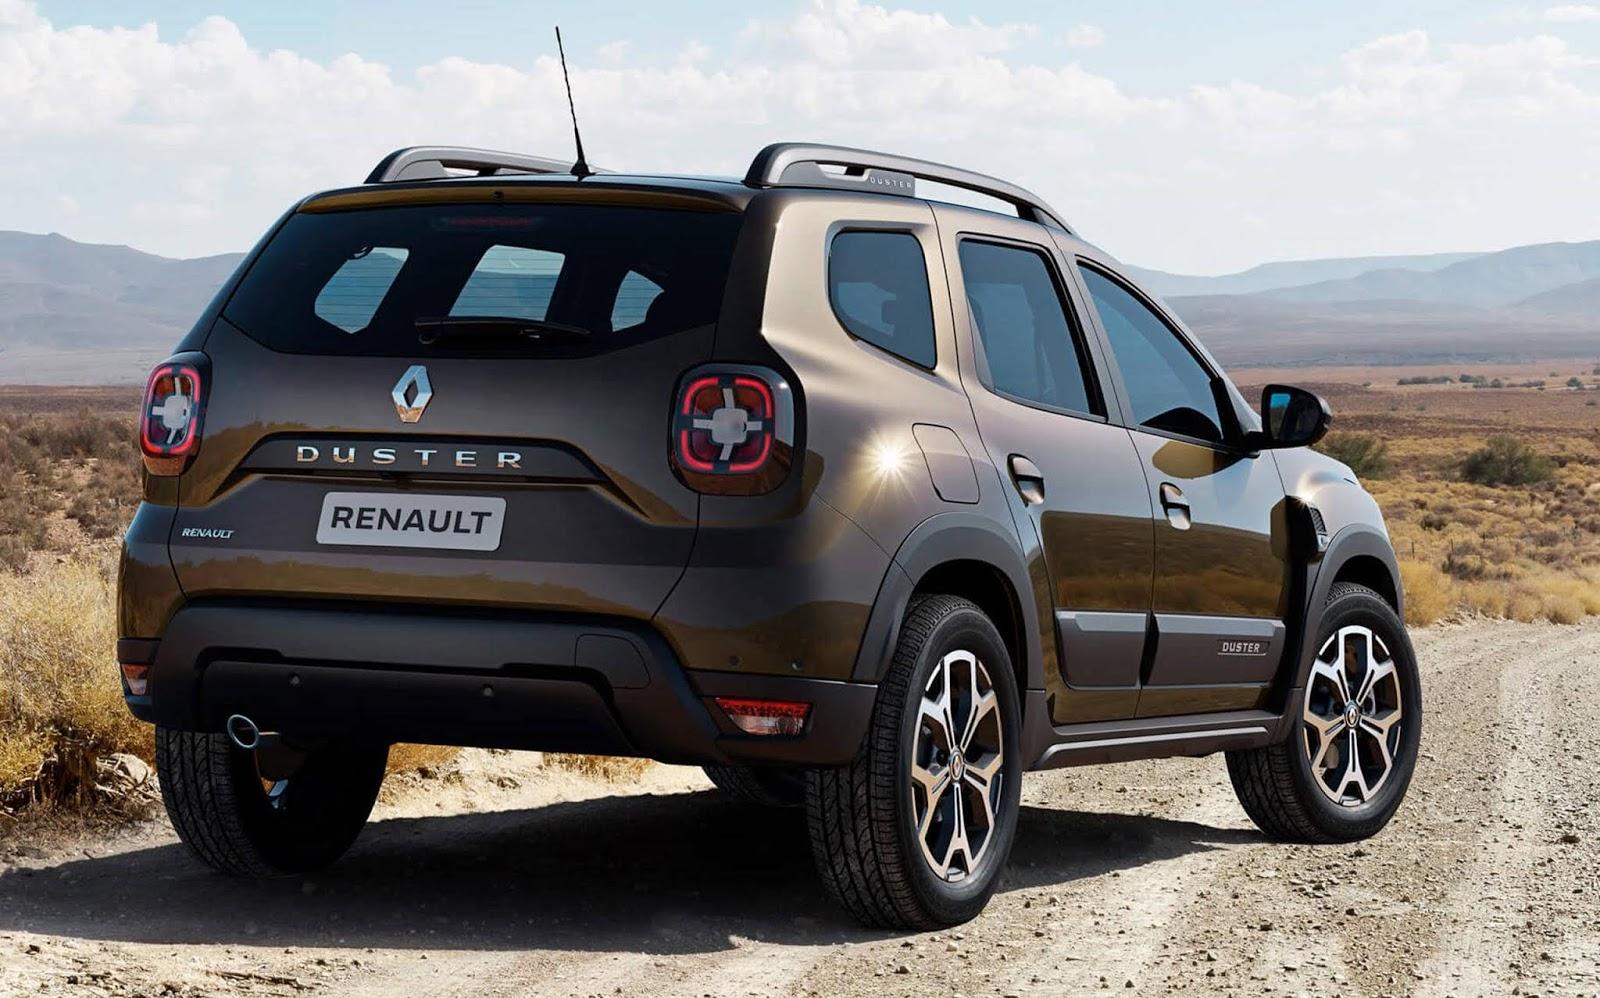 Renault Duster 1.3 turbo 2021